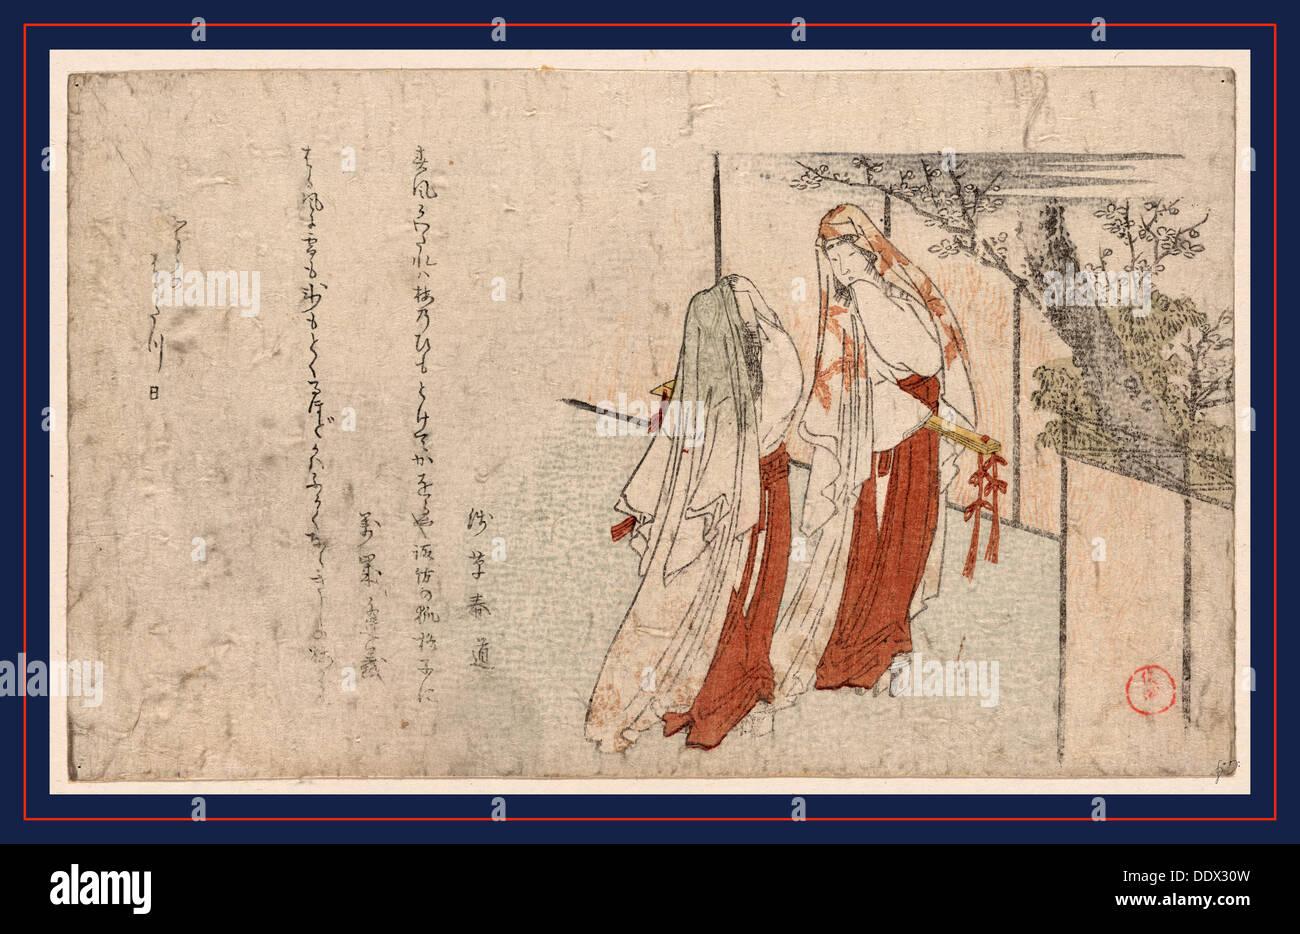 Katsugi no futari no onna, Two women wearing cloaks as veils. 1806., 1 print : woodcut, color ; 12.7 x 20.9 - Stock Image